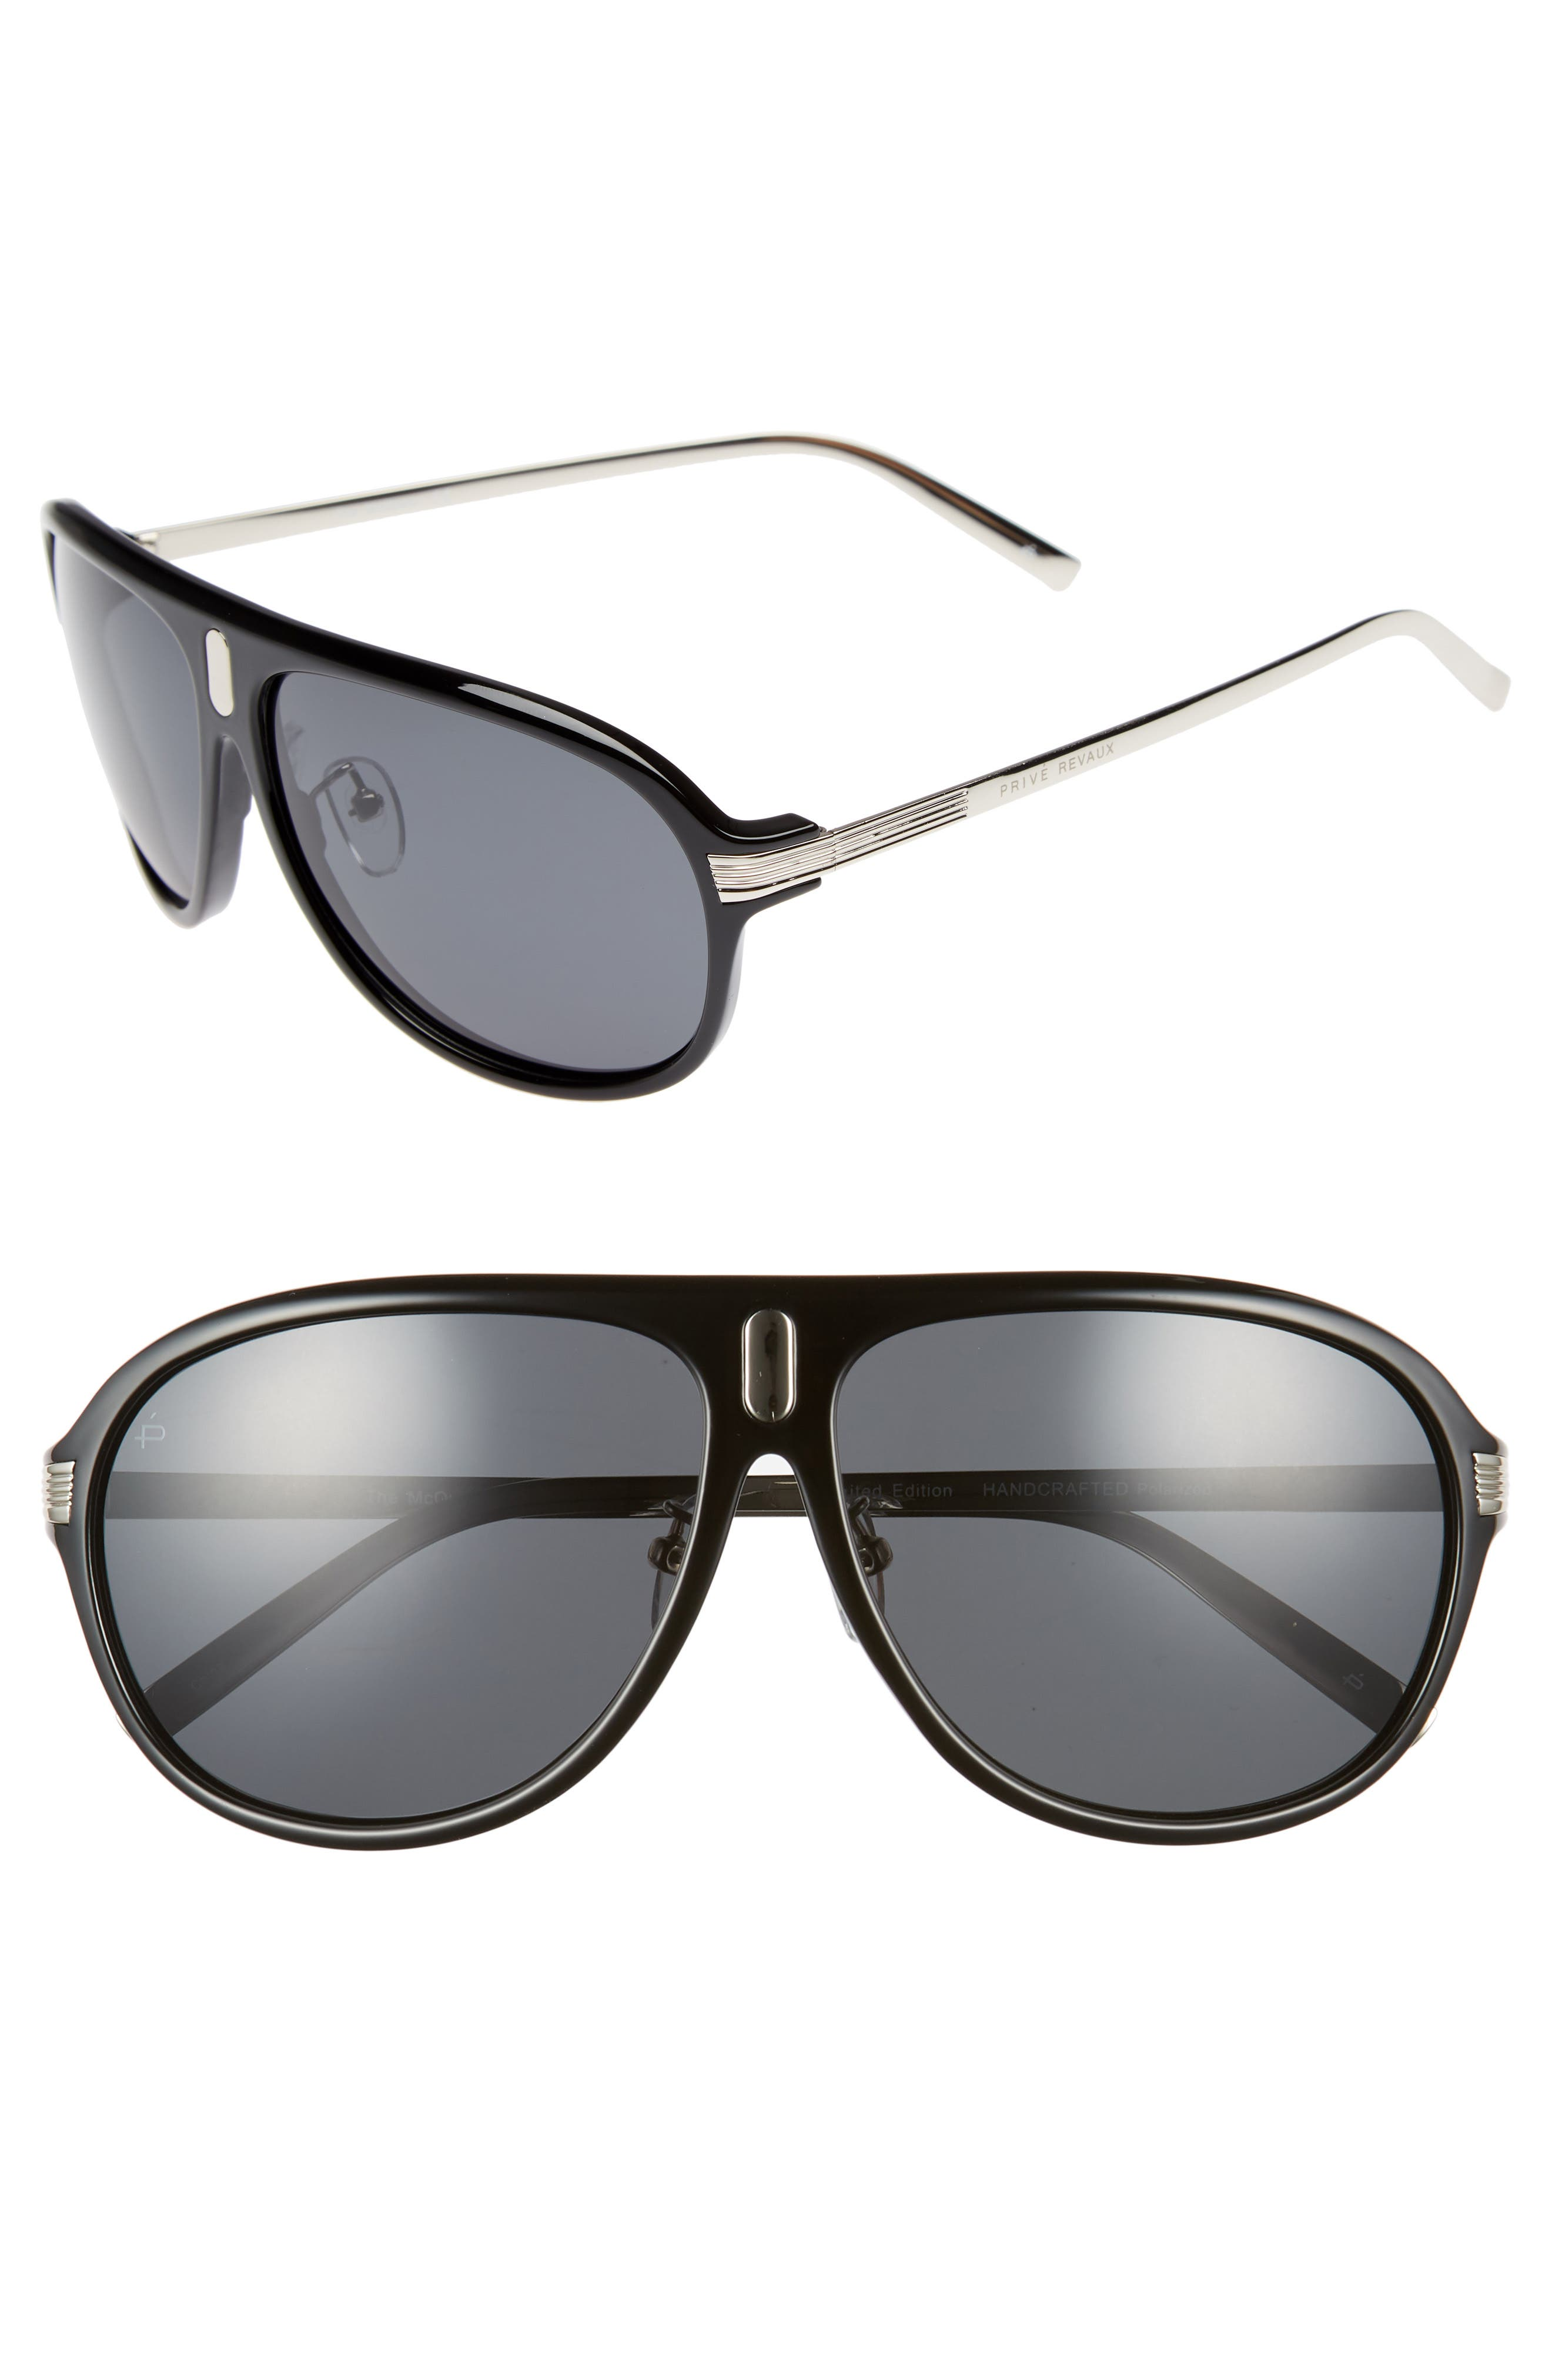 Privé Revaux The McQueen 62mm Polarized Aviator Sunglasses,                         Main,                         color, 001